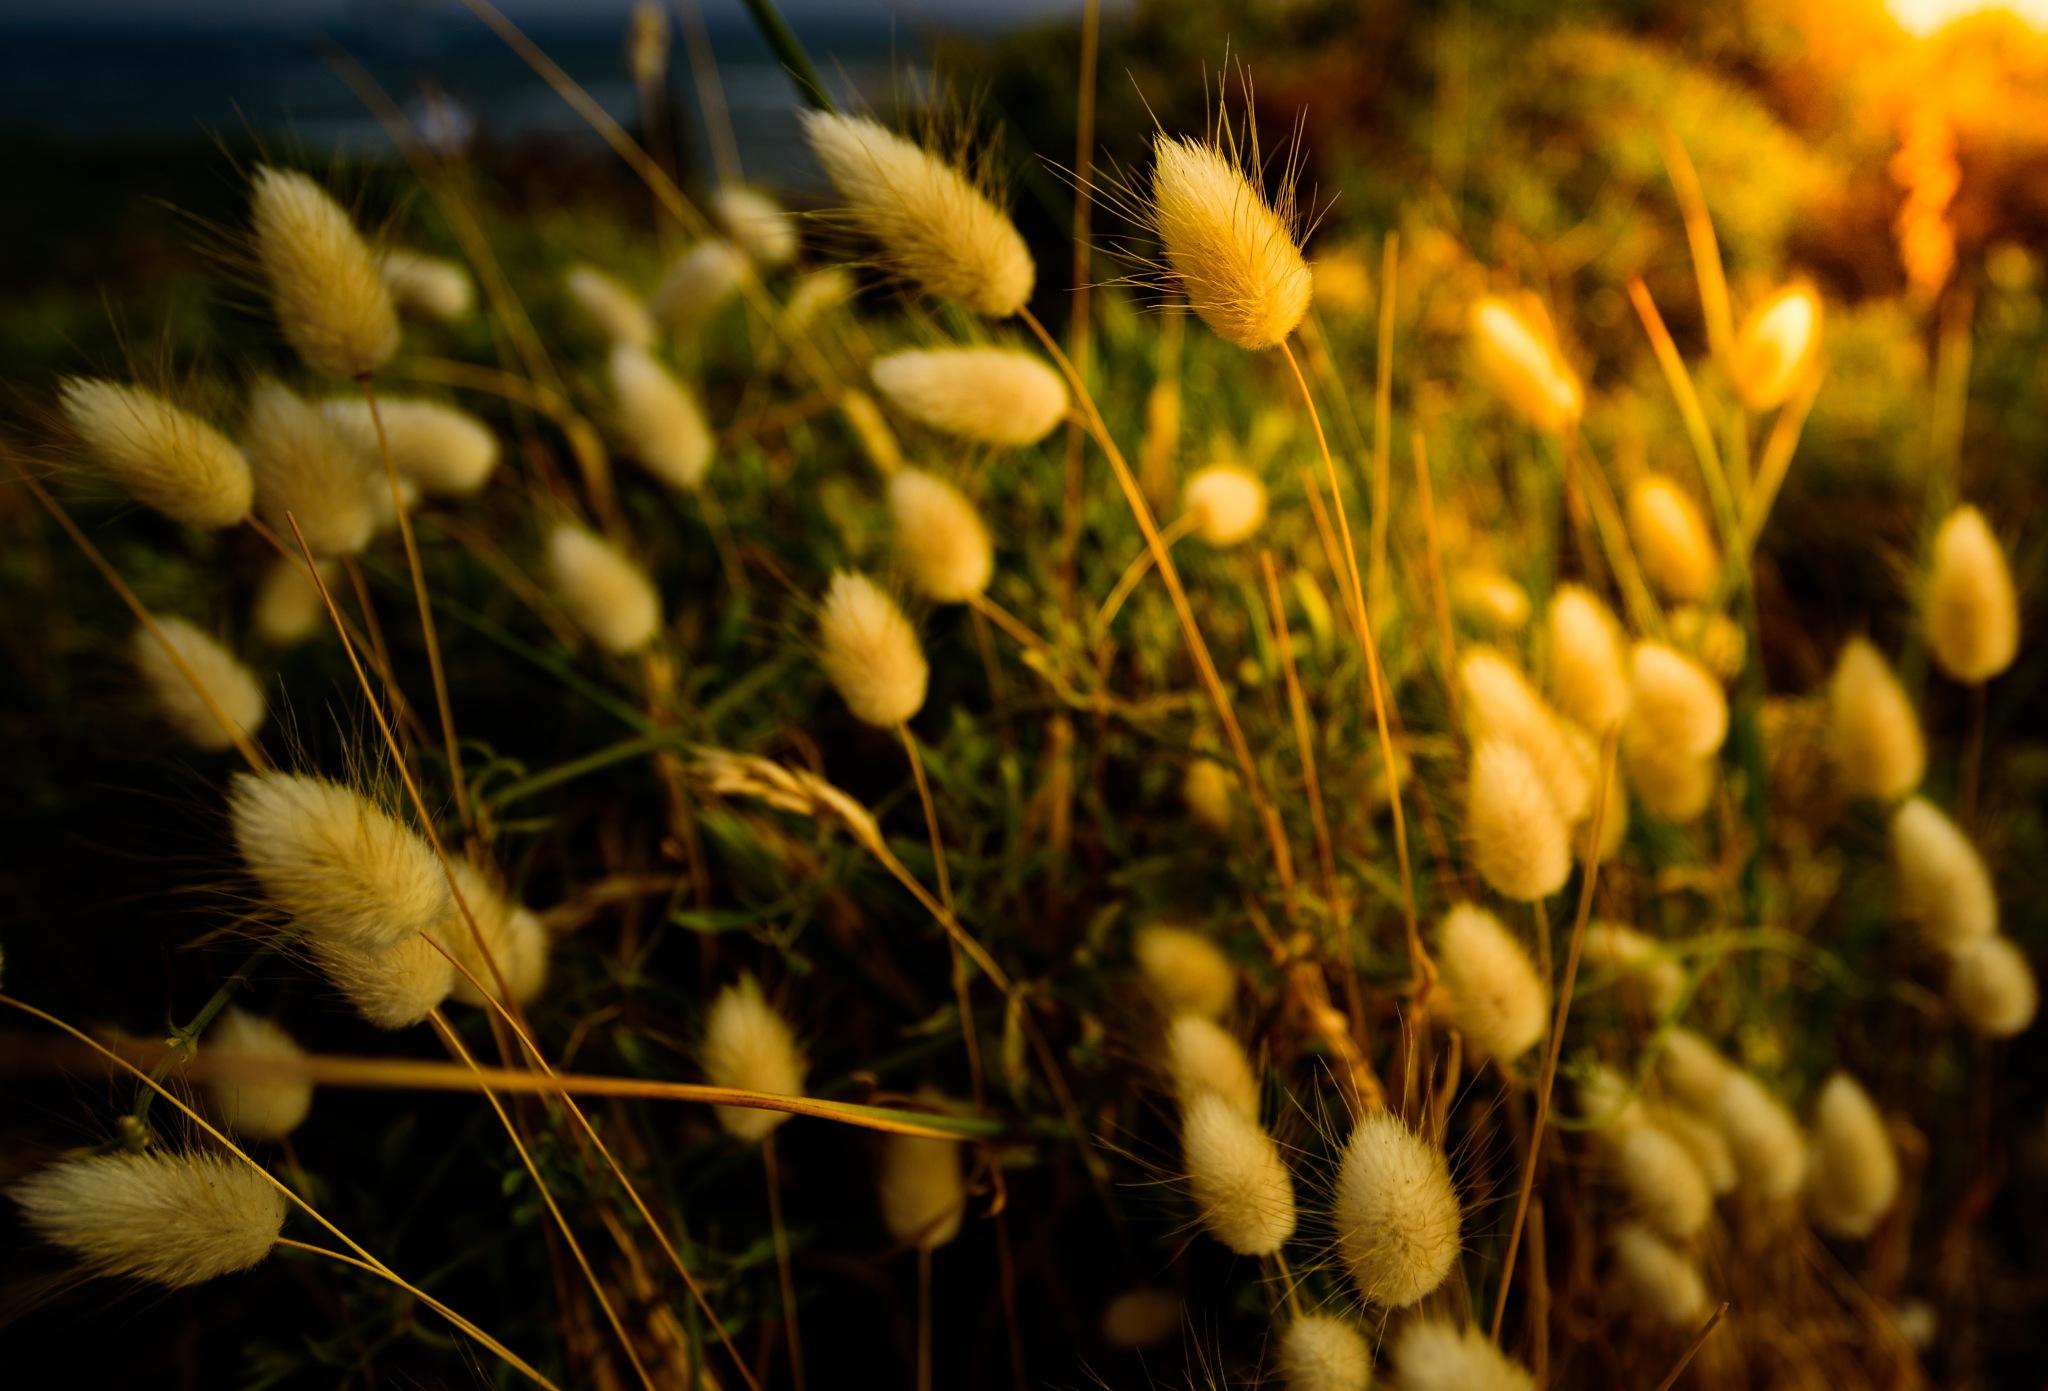 Lights at golden hour by Muntasir